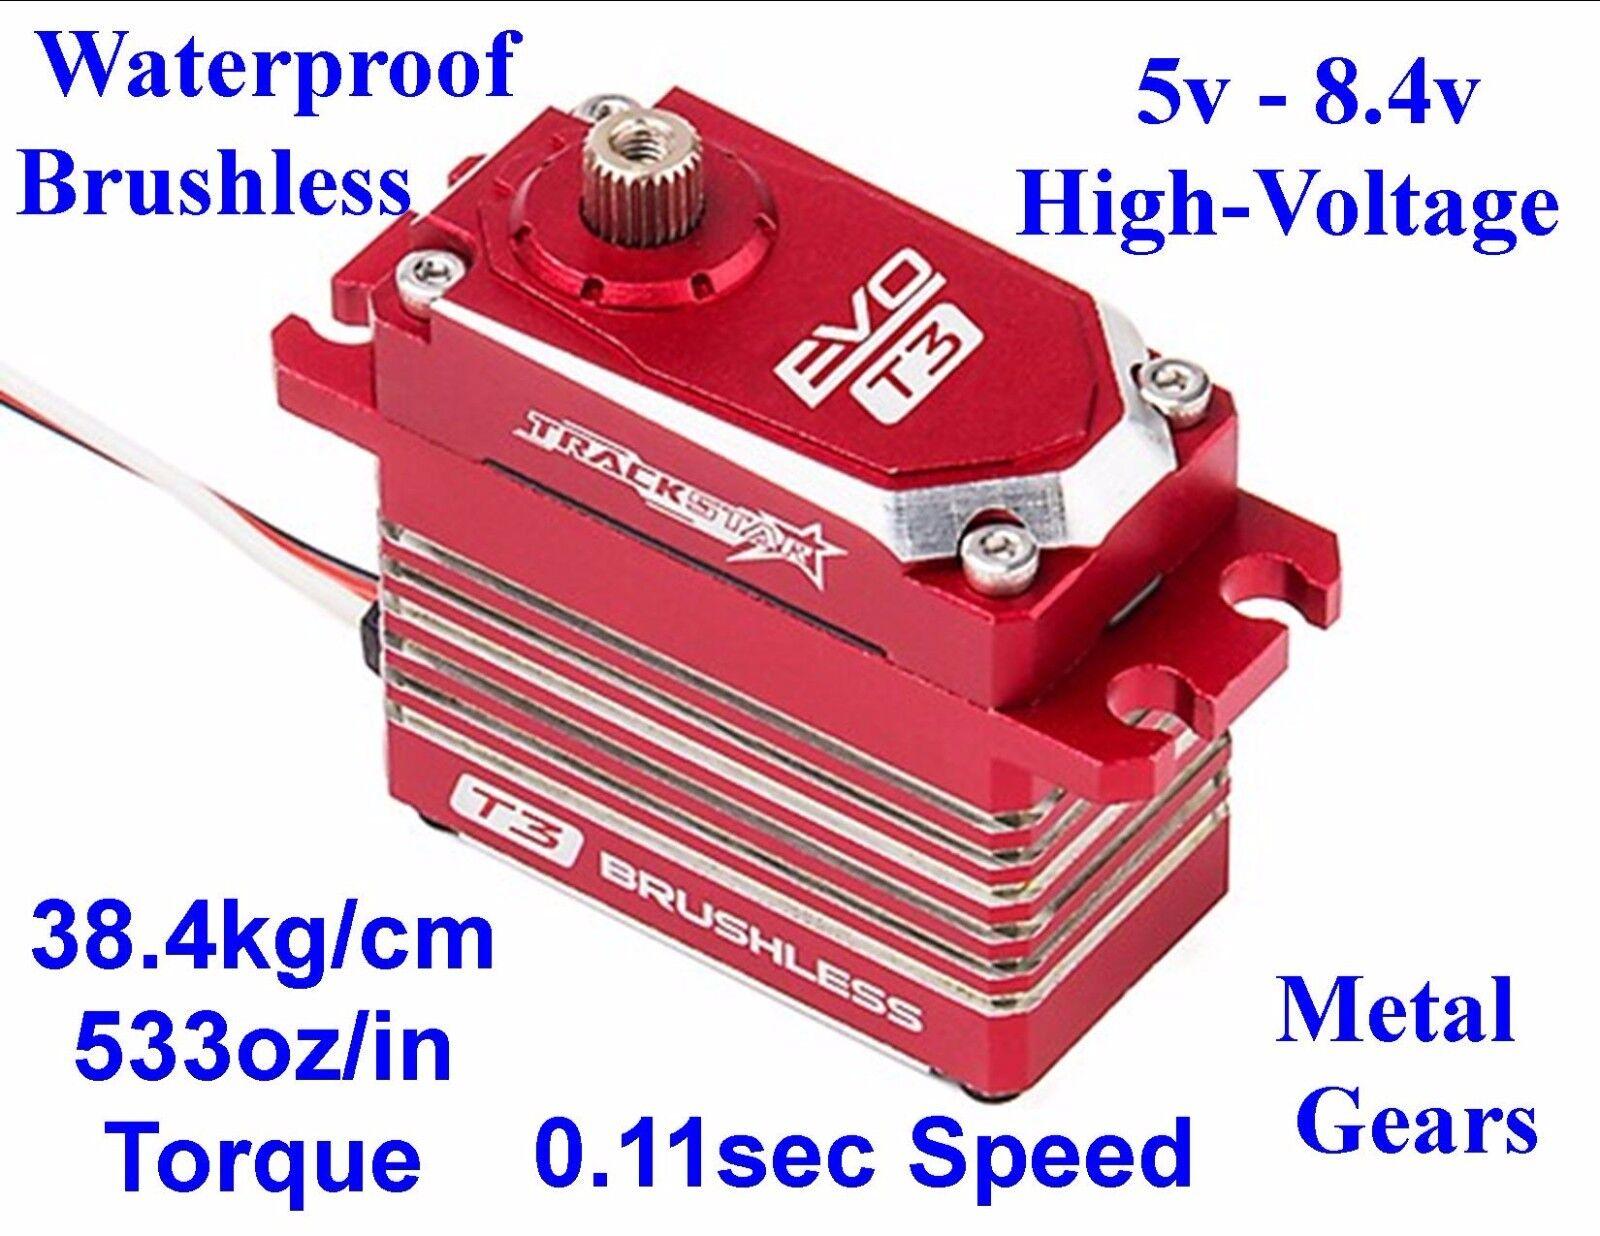 Evo t3 brstenlose hv - upgrade fr futaba s3305 bls254 hitec hsb-9380 d950tw